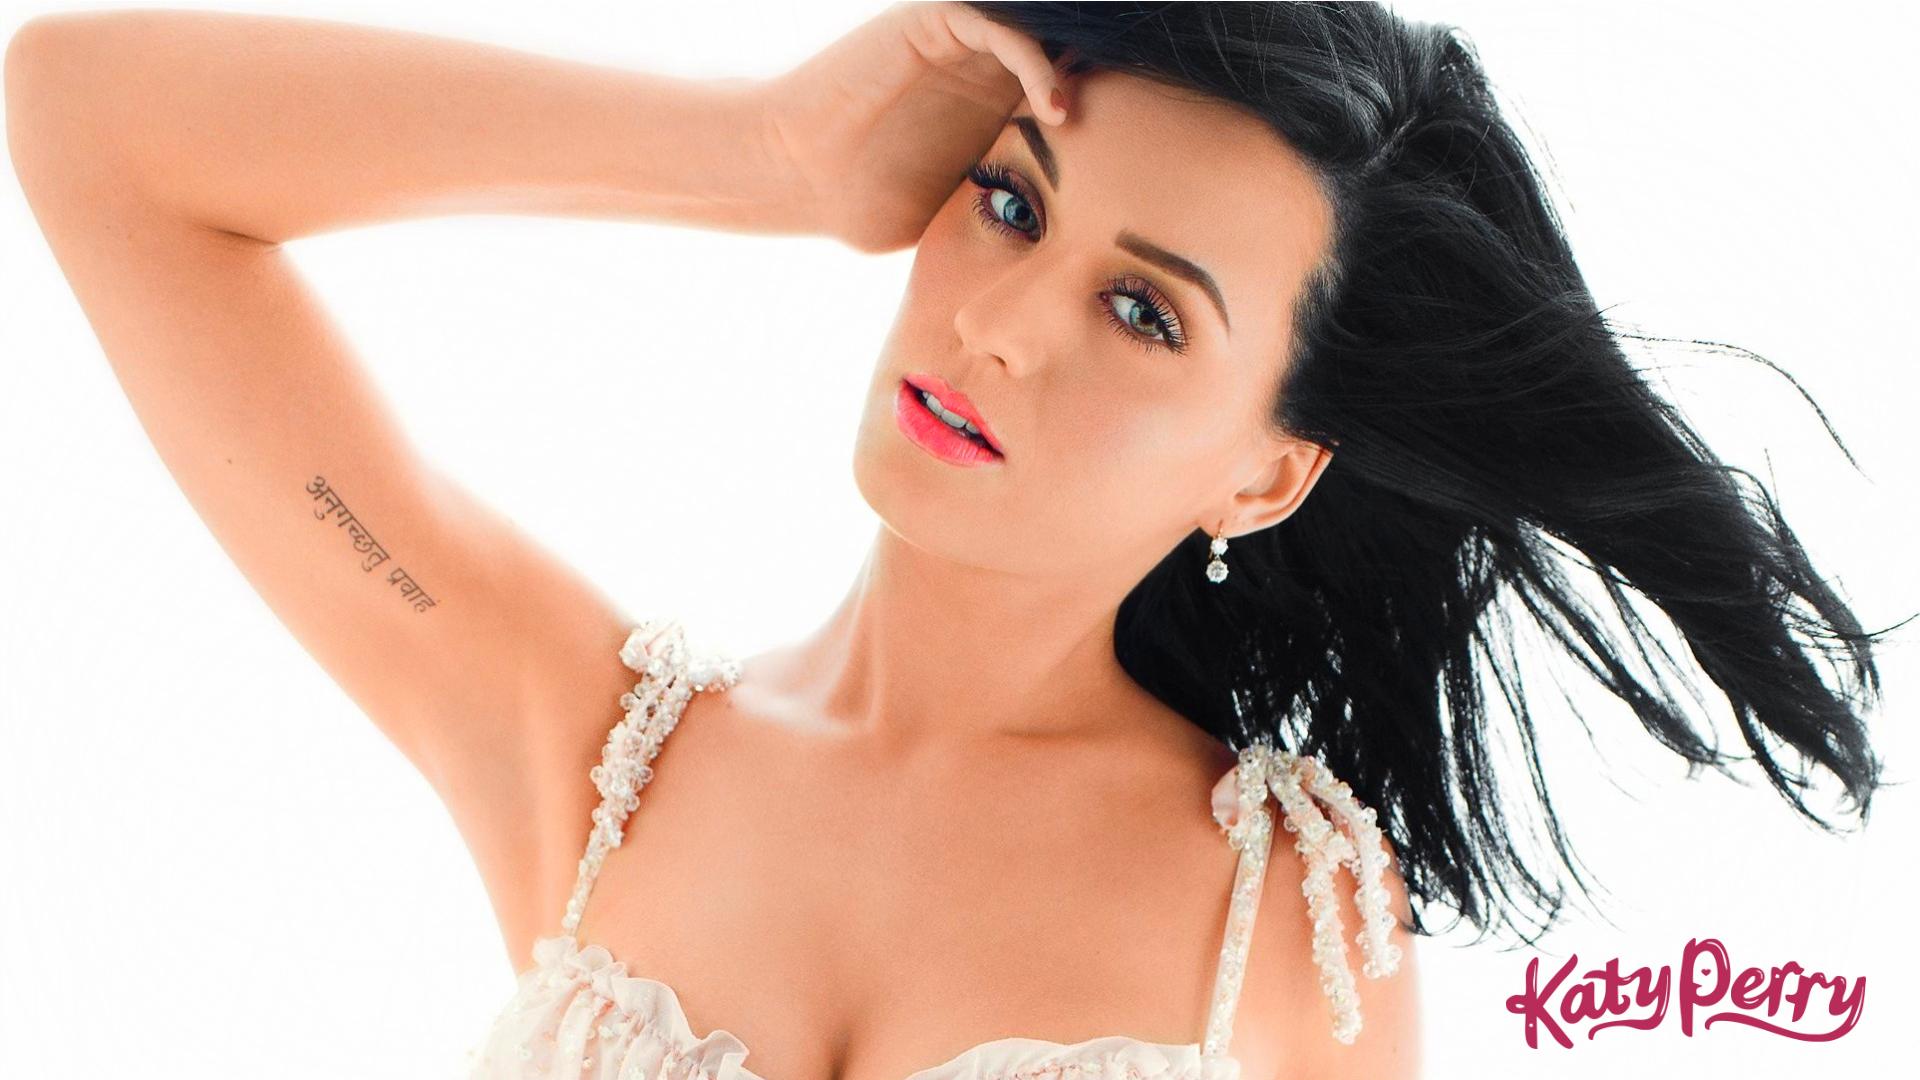 Katy Perry Wallpaper white dress